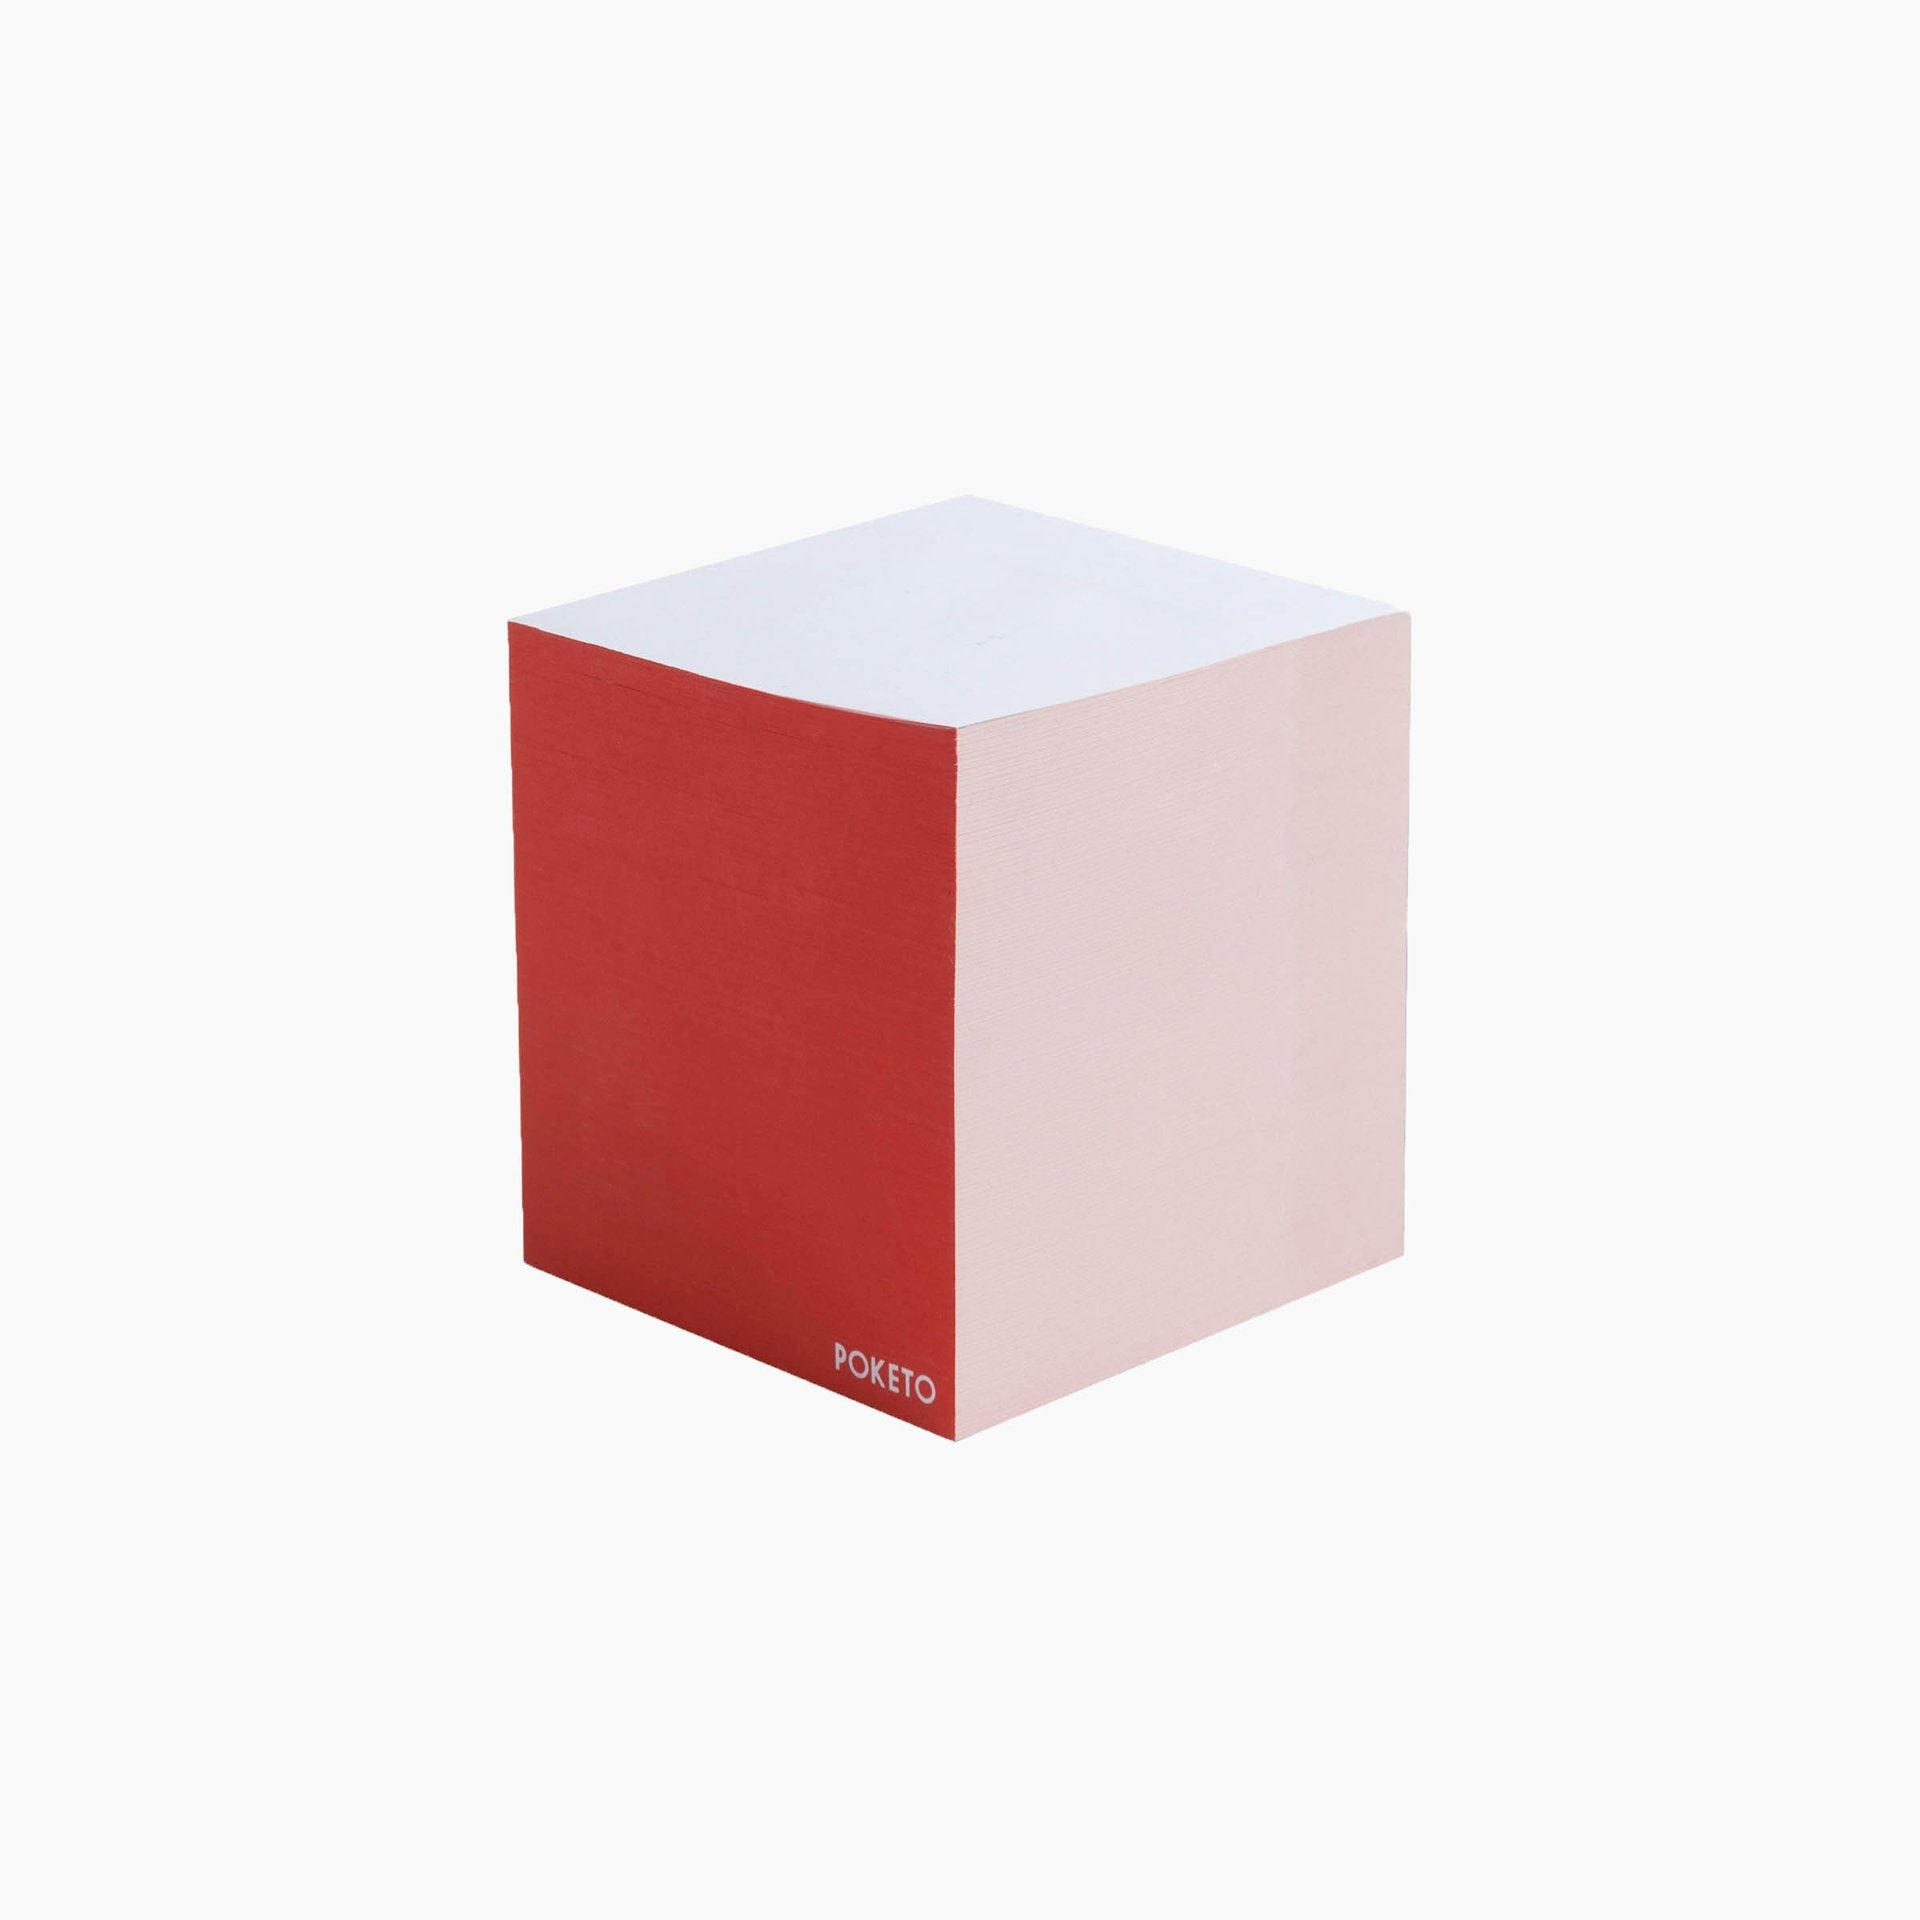 tower_noteblocks_2400-3-revised_7a6a6d97-3505-4827-812a-db9108781bfe_1920x